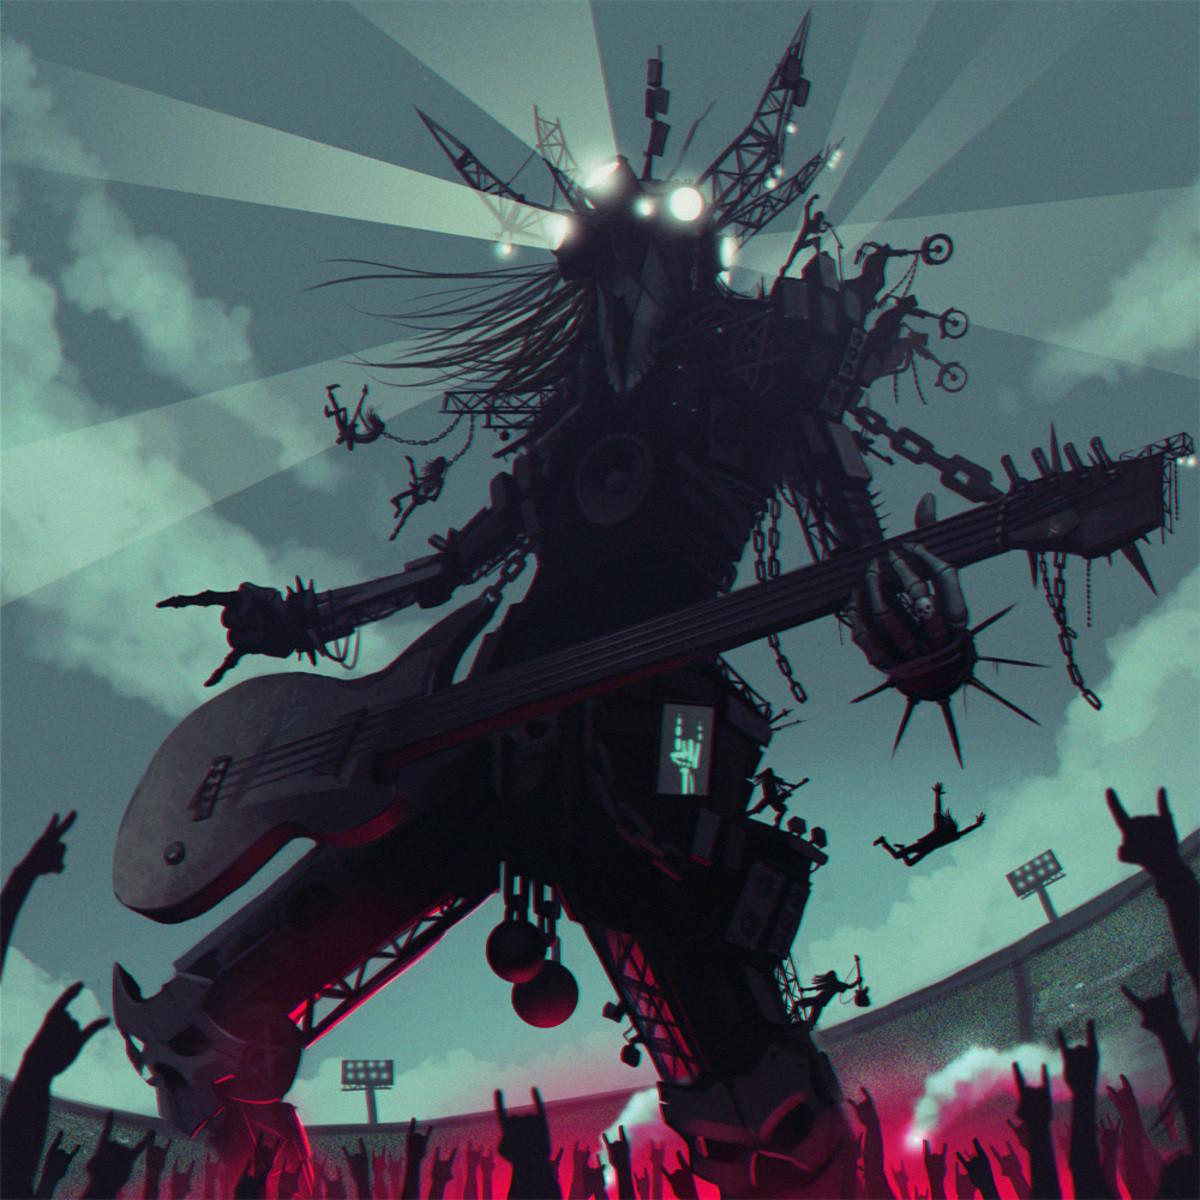 Metal God by Mihail Glooh. .. Friggin awesome Woodley widdley wahhh